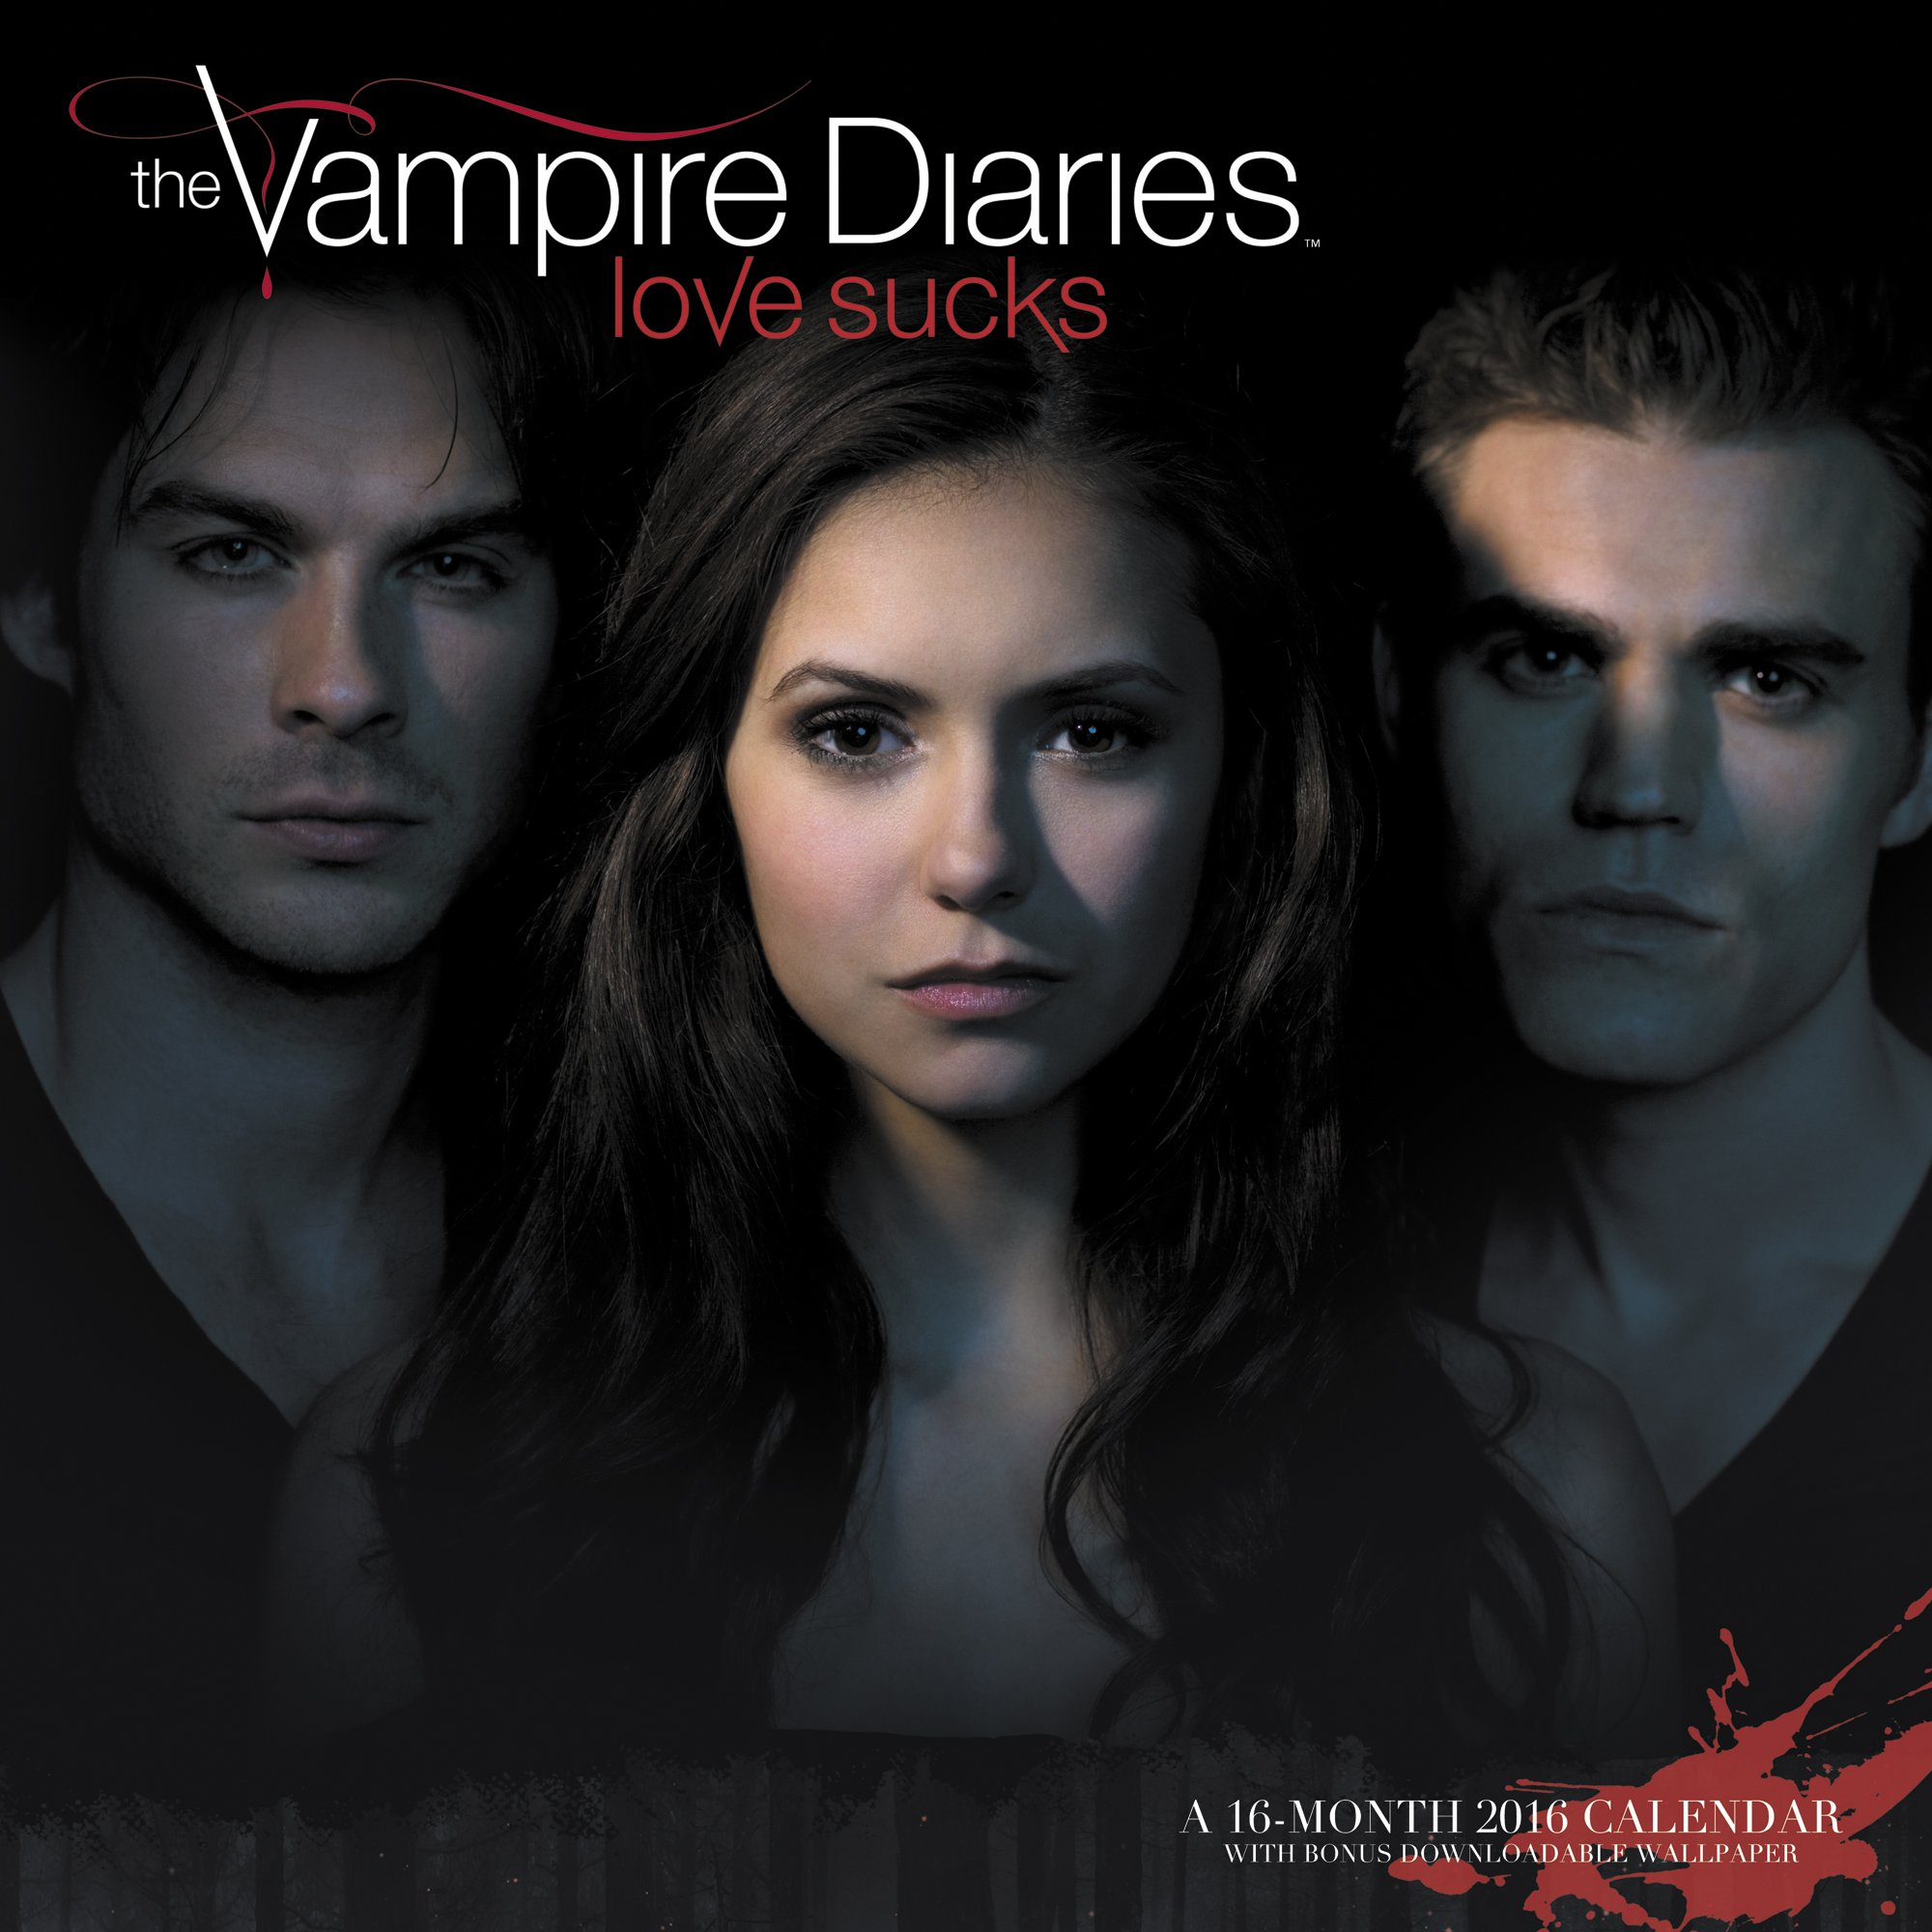 Vampire Diaries 2016 Calendar: Amazon.es: ACCO Brands ...